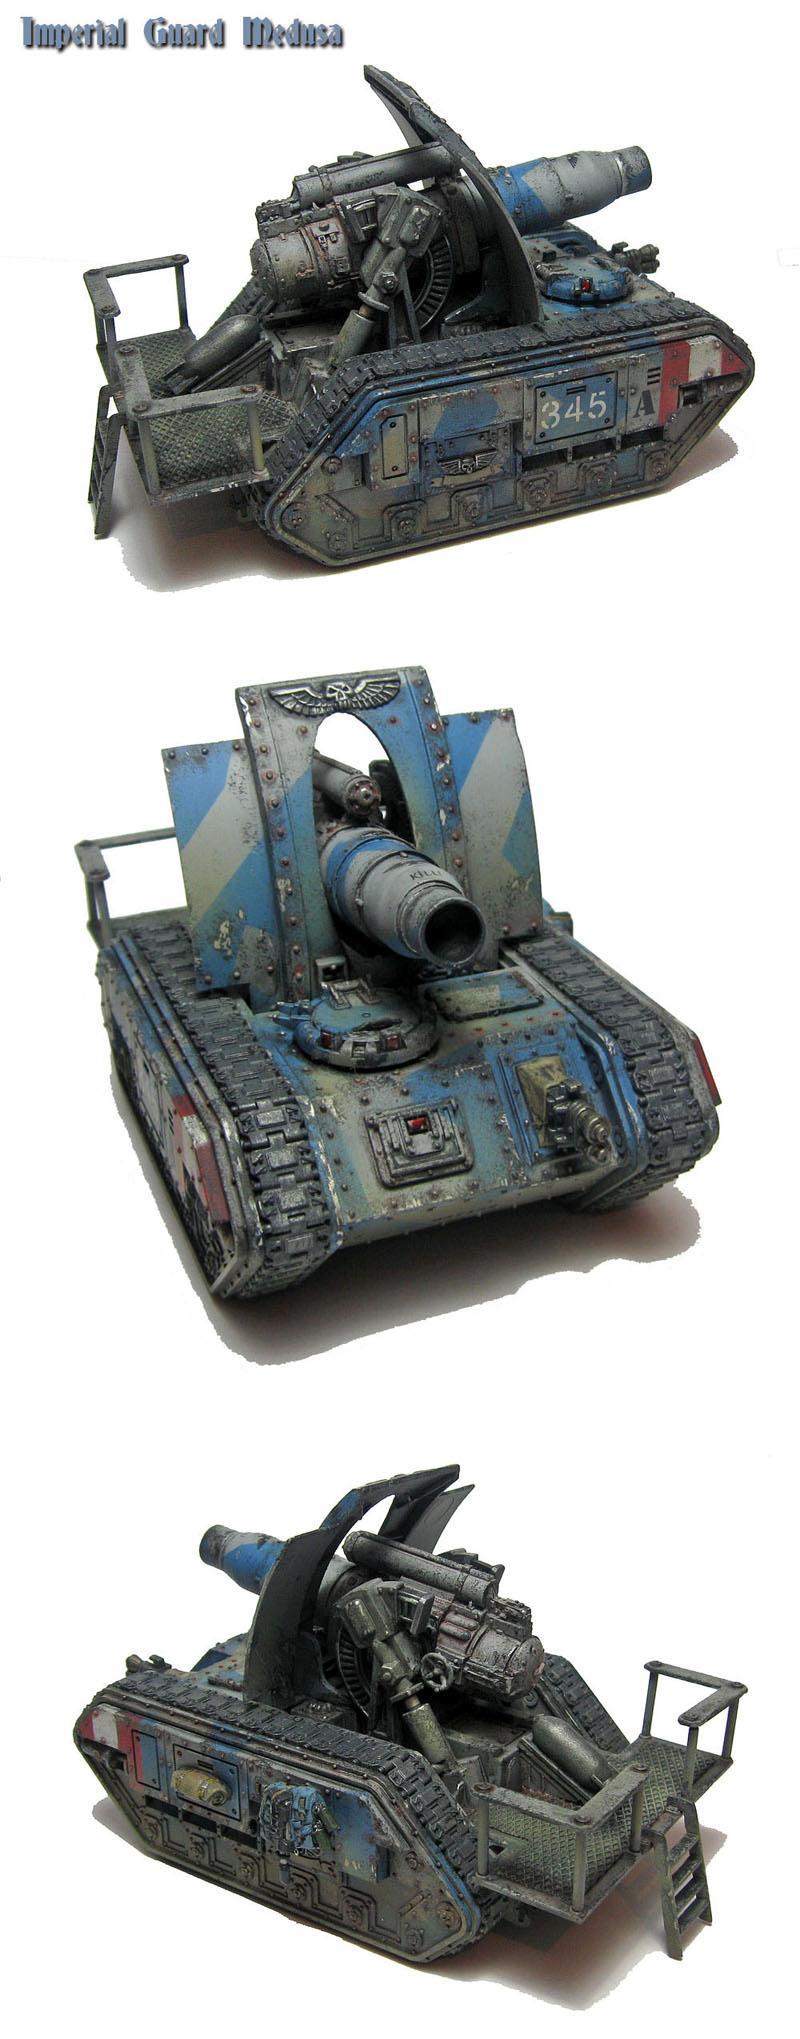 Artillery, Forge World, Imperial Guard, Medusa